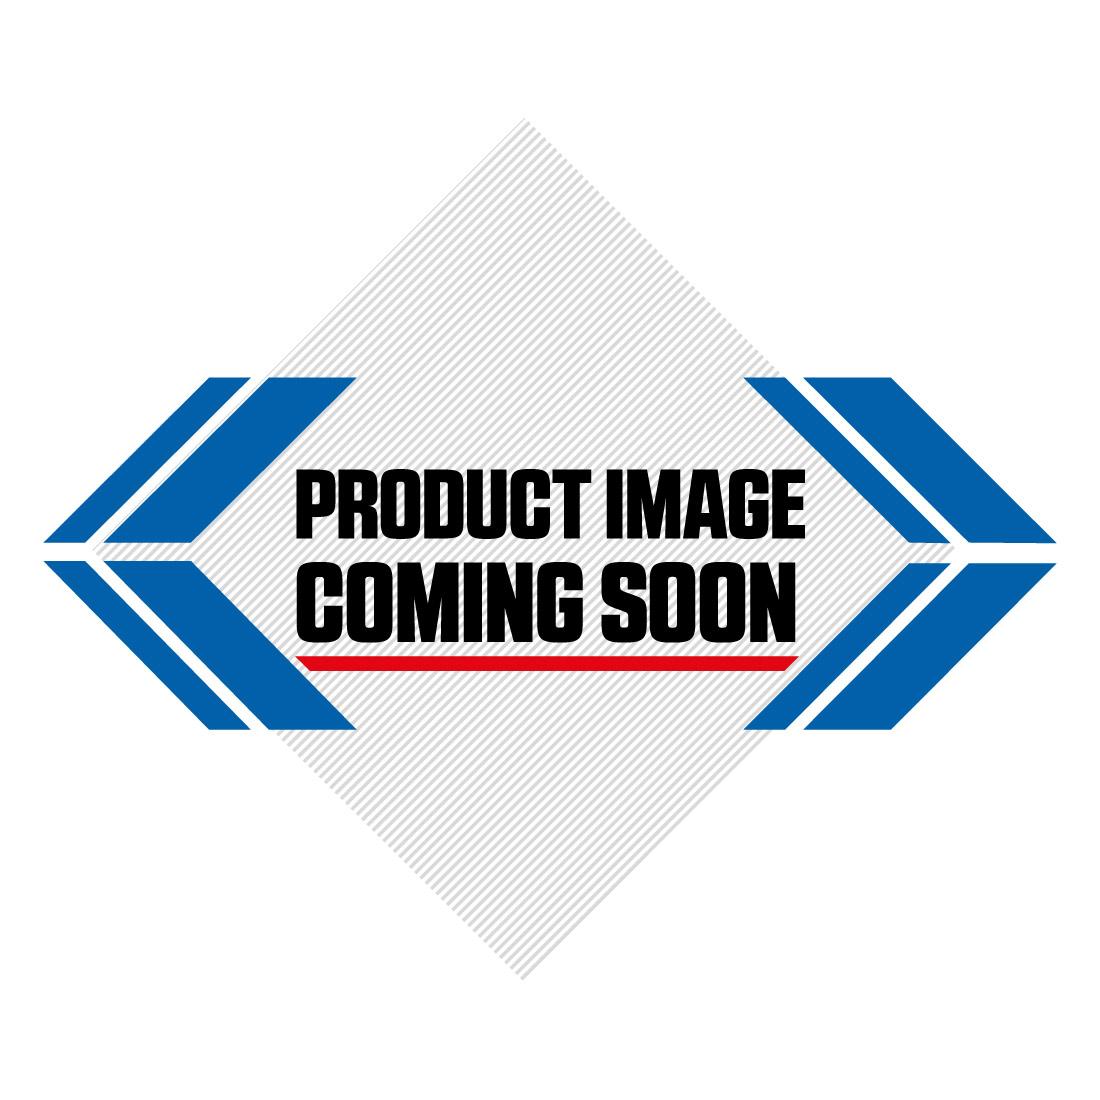 DJI Mavic Pro Platinum Drone Image-4>